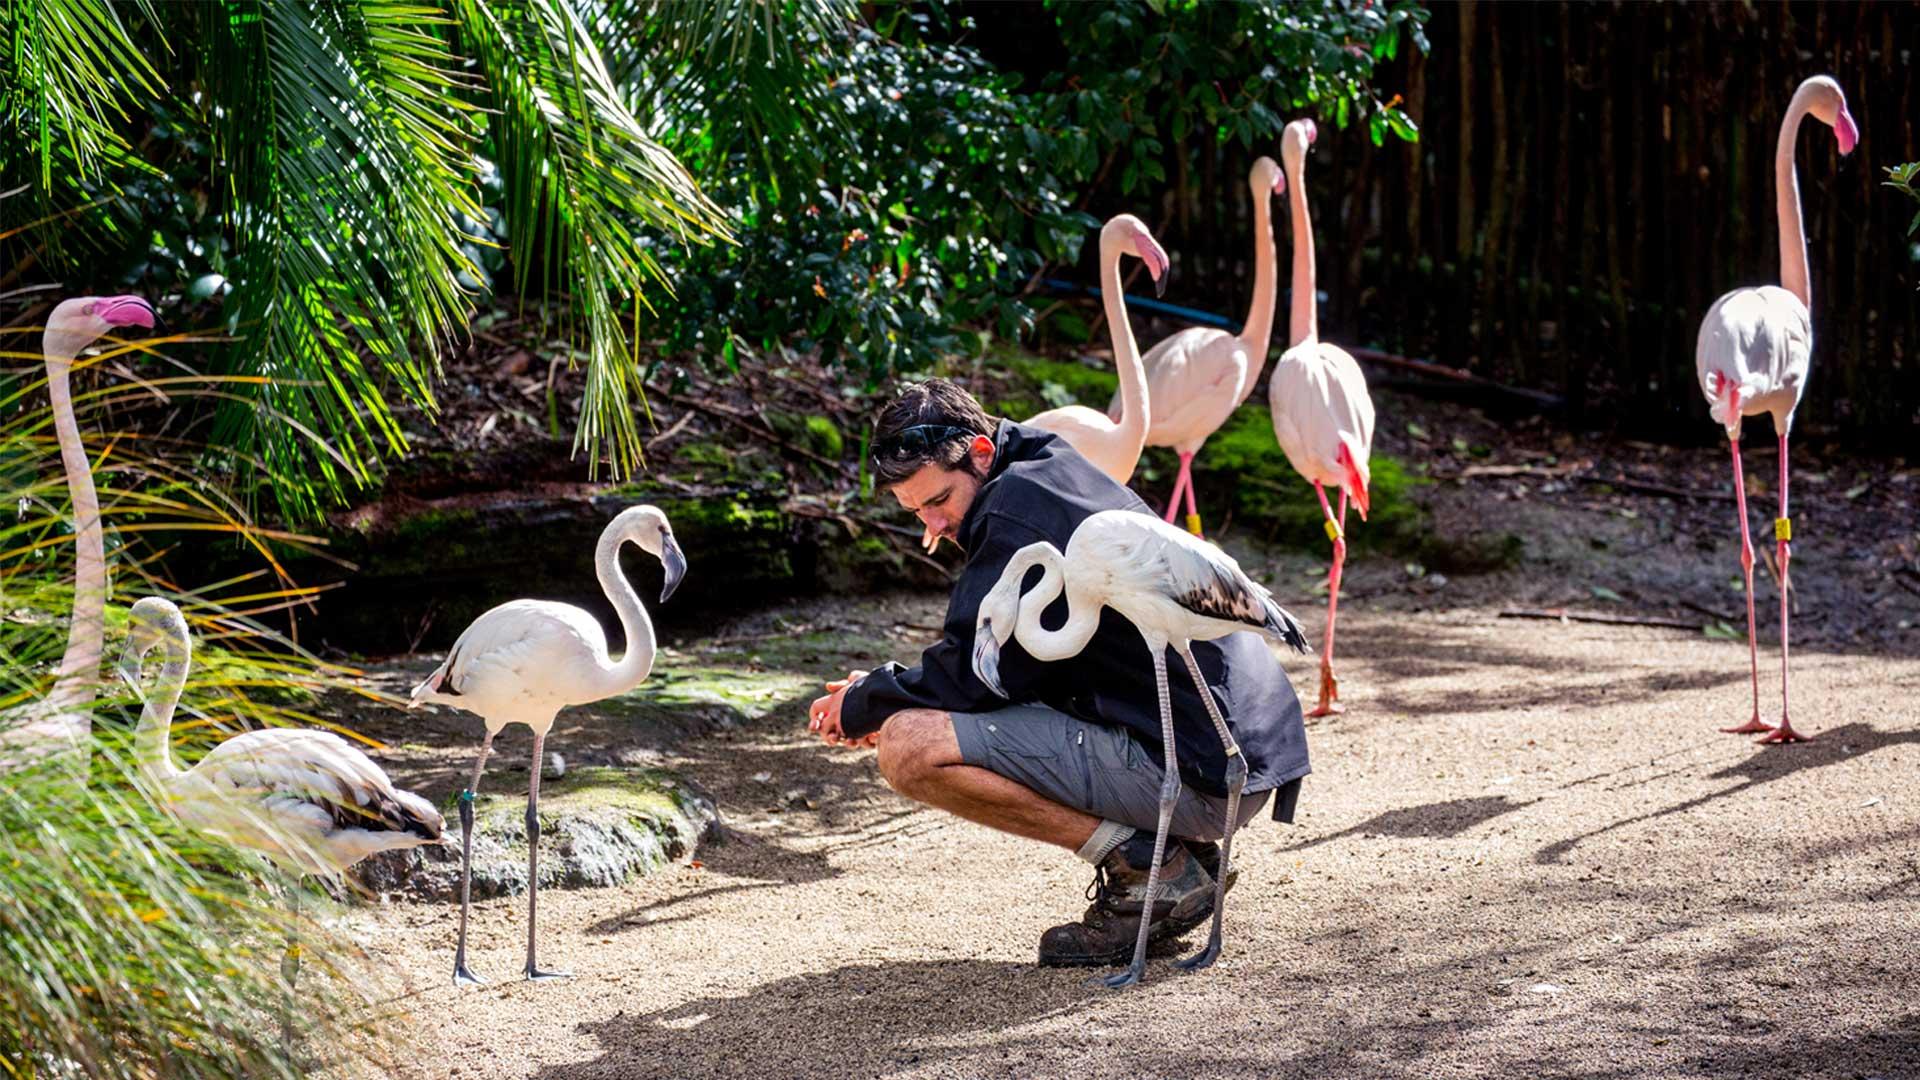 https://rfacdn.nz/zoo/assets/media/flamingo-gallery-1.jpg